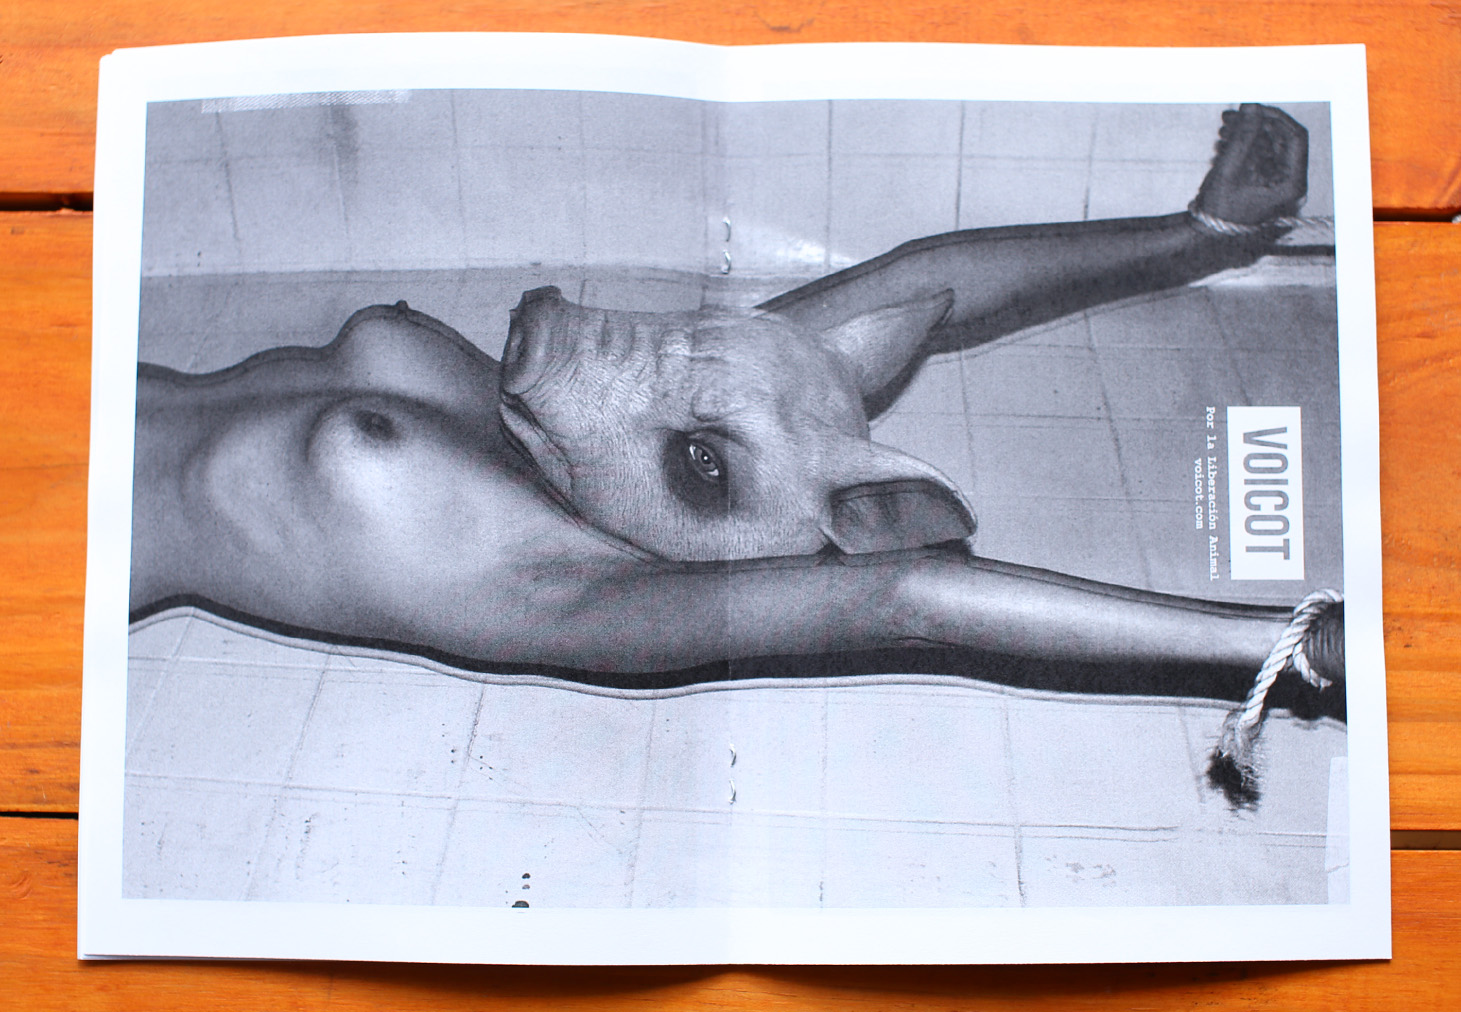 Fanzine Web 007